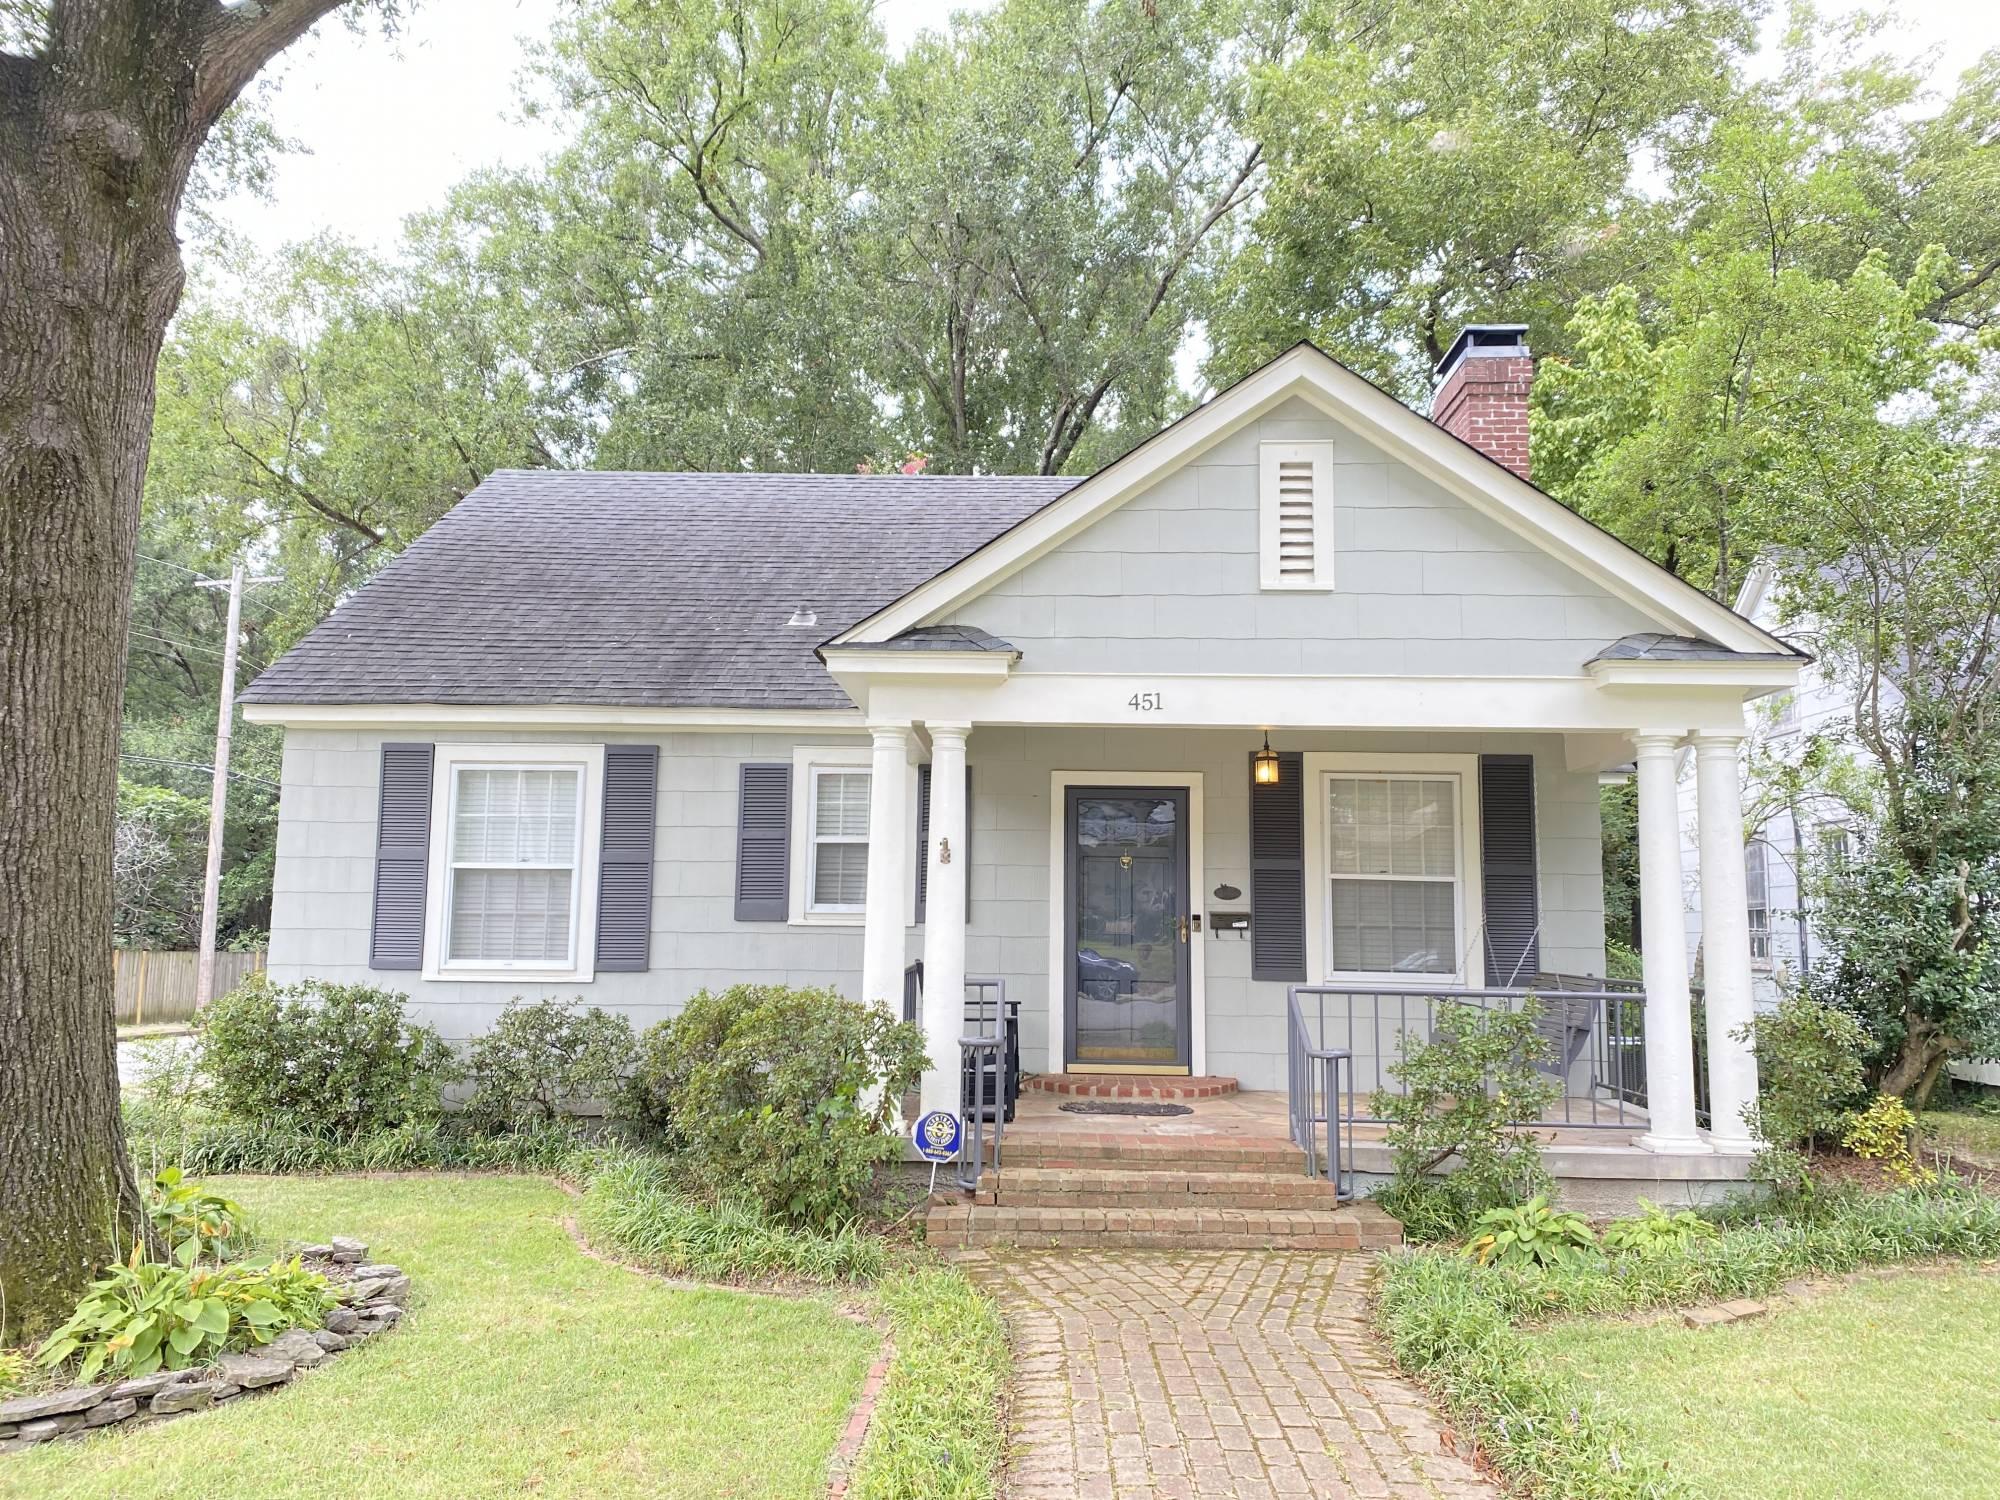 451 S Reese St Memphis TN 38111